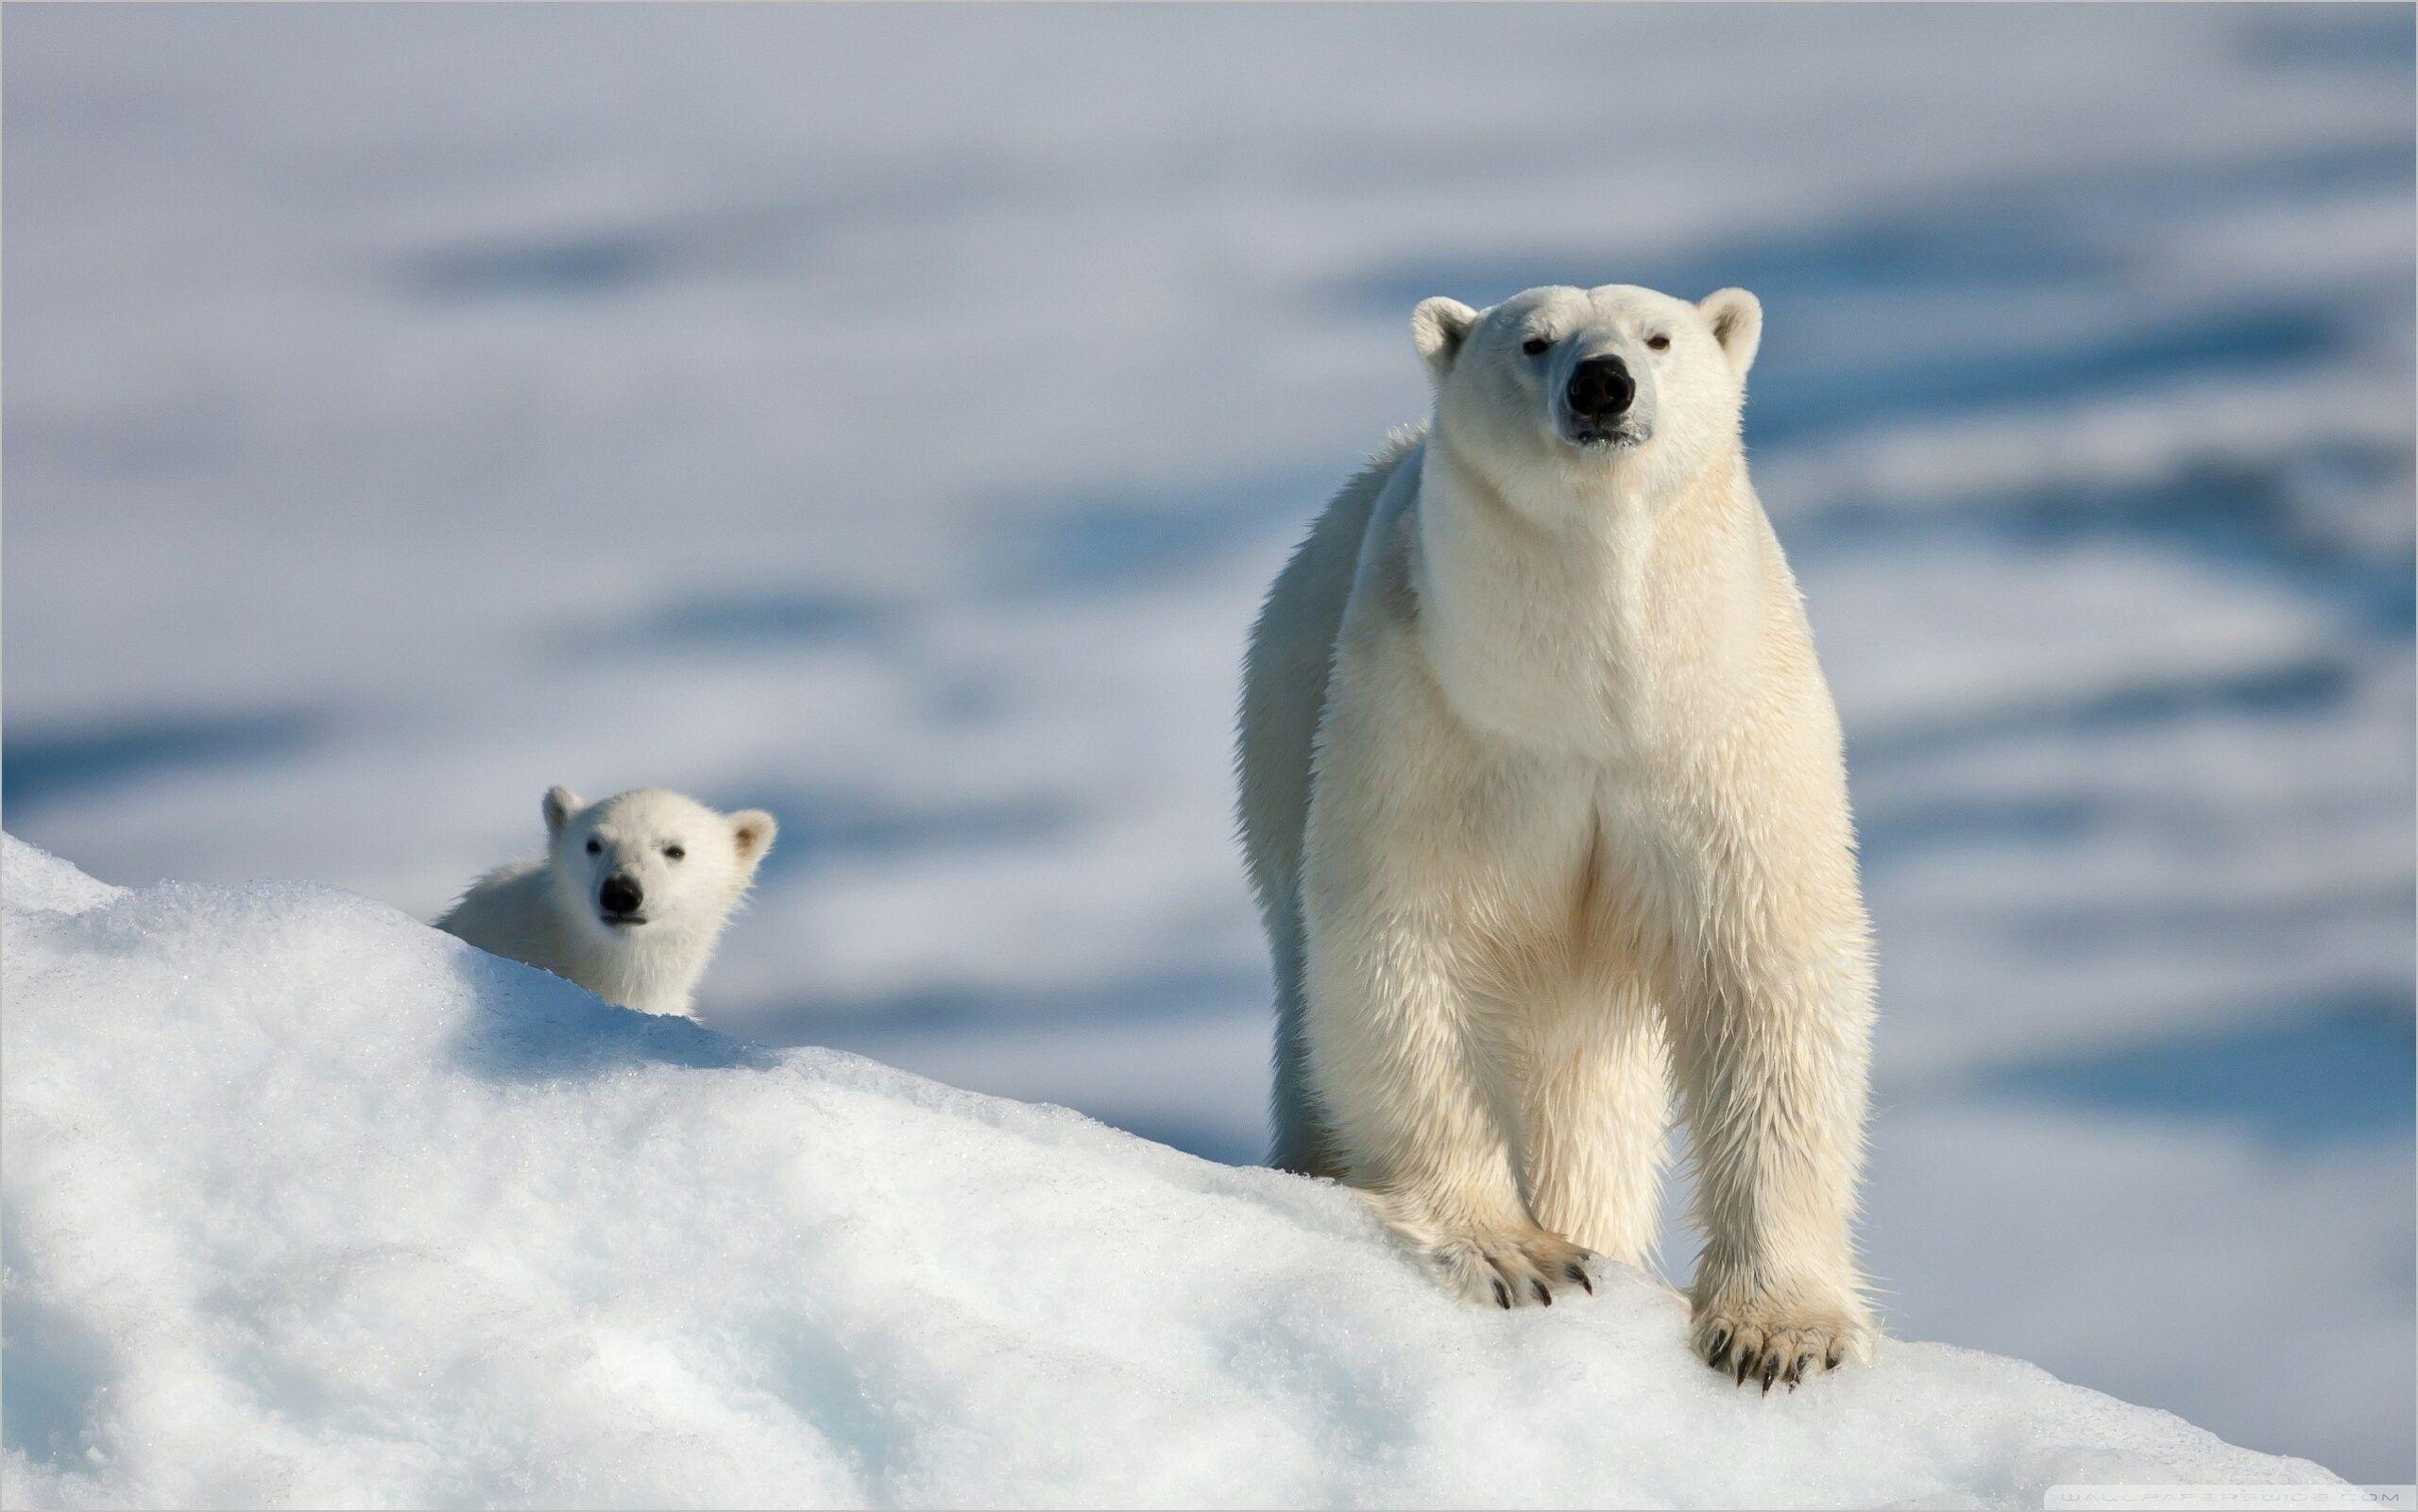 Polar Bear 4k Wallpaper Polar Bear Baby Polar Bears Cute Polar Bear